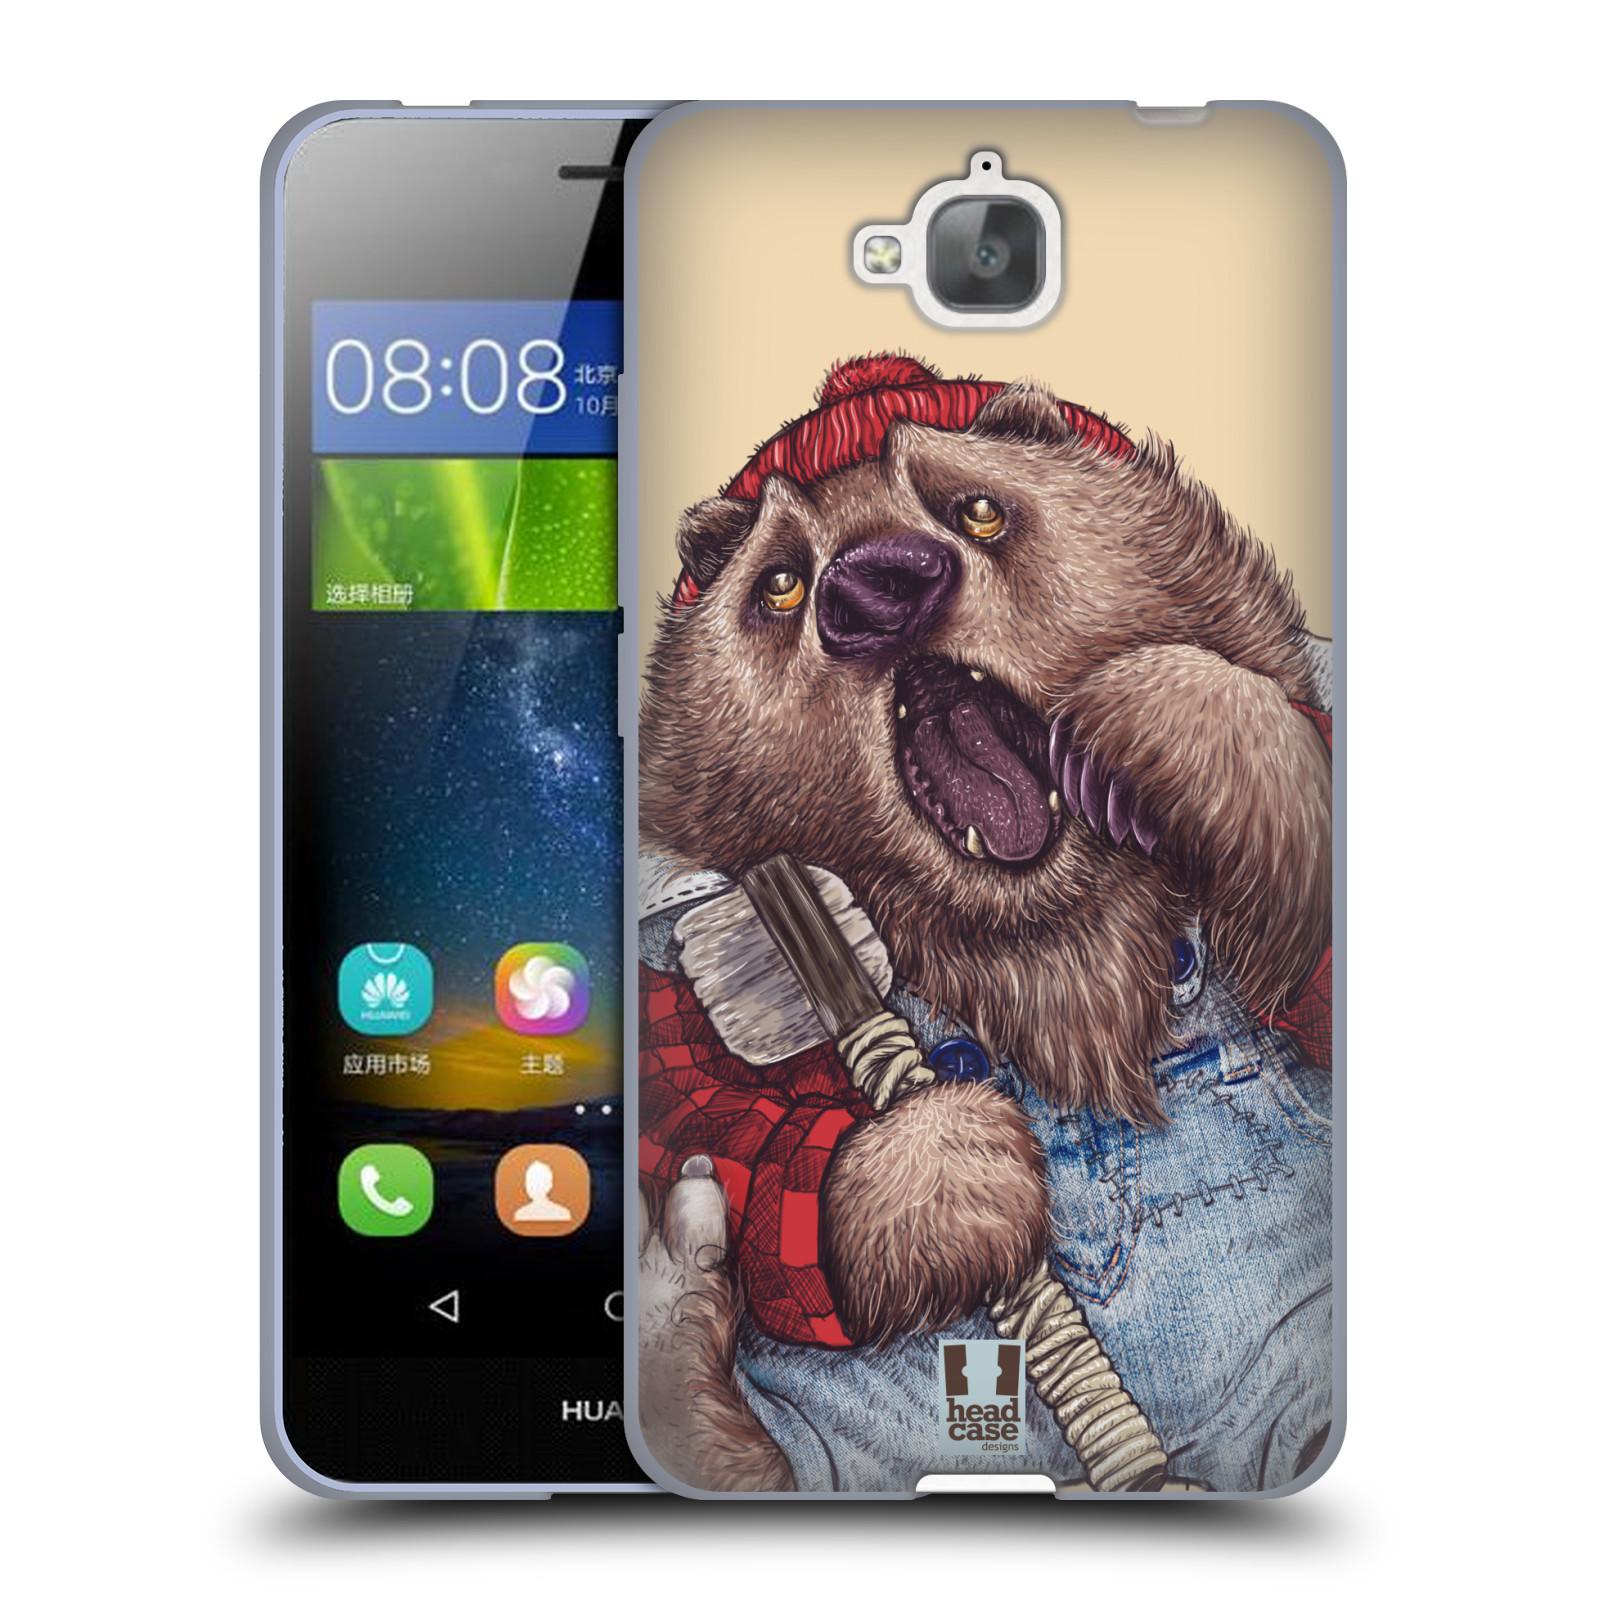 Silikonové pouzdro na mobil Huawei Y6 Pro Dual Sim HEAD CASE ANIMPLA MEDVĚD